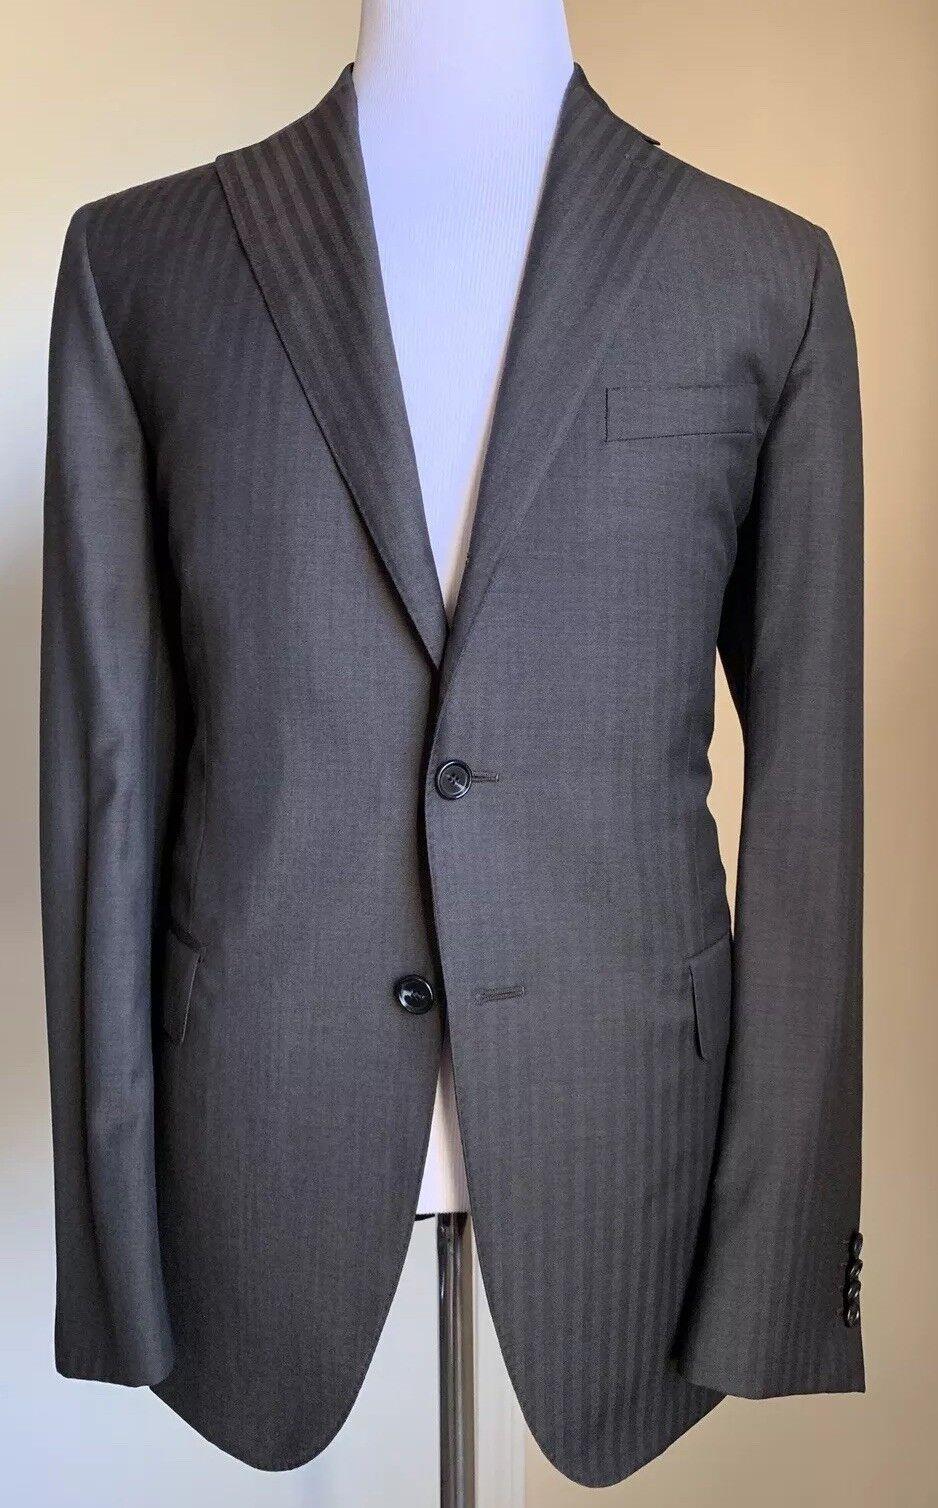 New 1500 Caruso  Herren Neaplitan Suit Super 110S DK Braun 44R US ( 54R Eur)